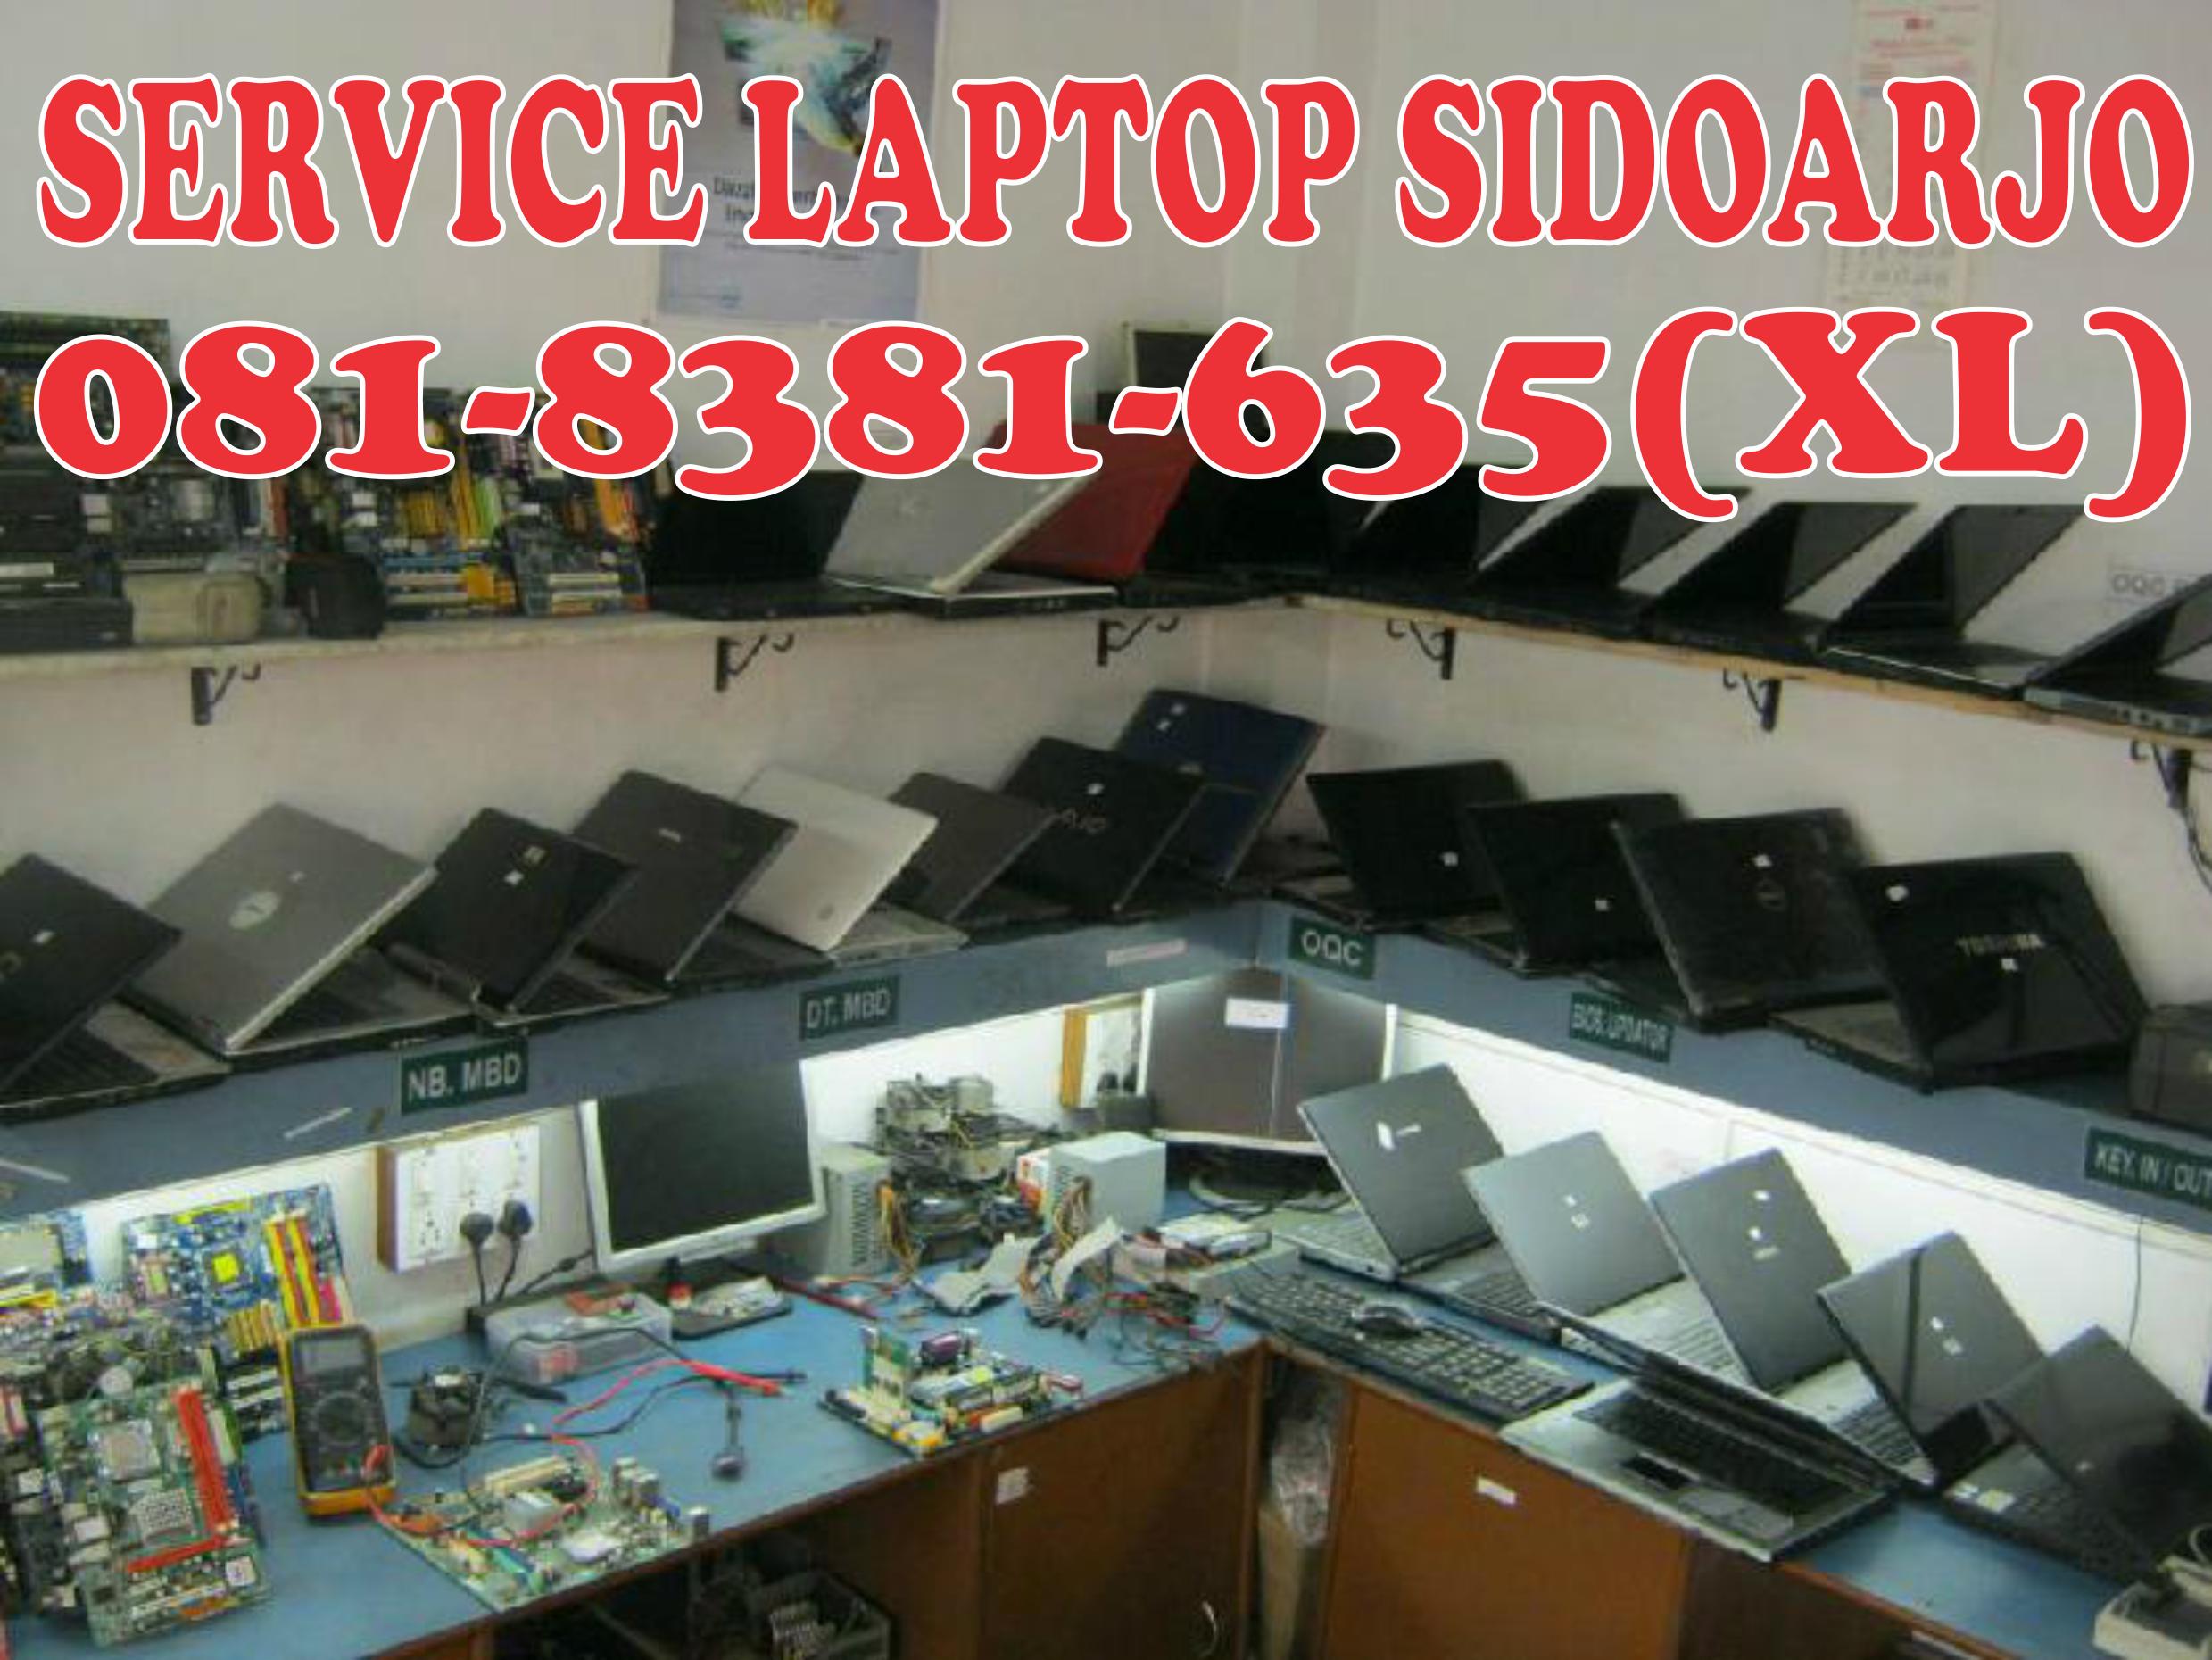 081 8381 635 XL Service Center Laptop Fujitsu Service Center Laptop Fujitsu Sidoarjo Service Center Laptop Fujitsu Di Sidoarjo